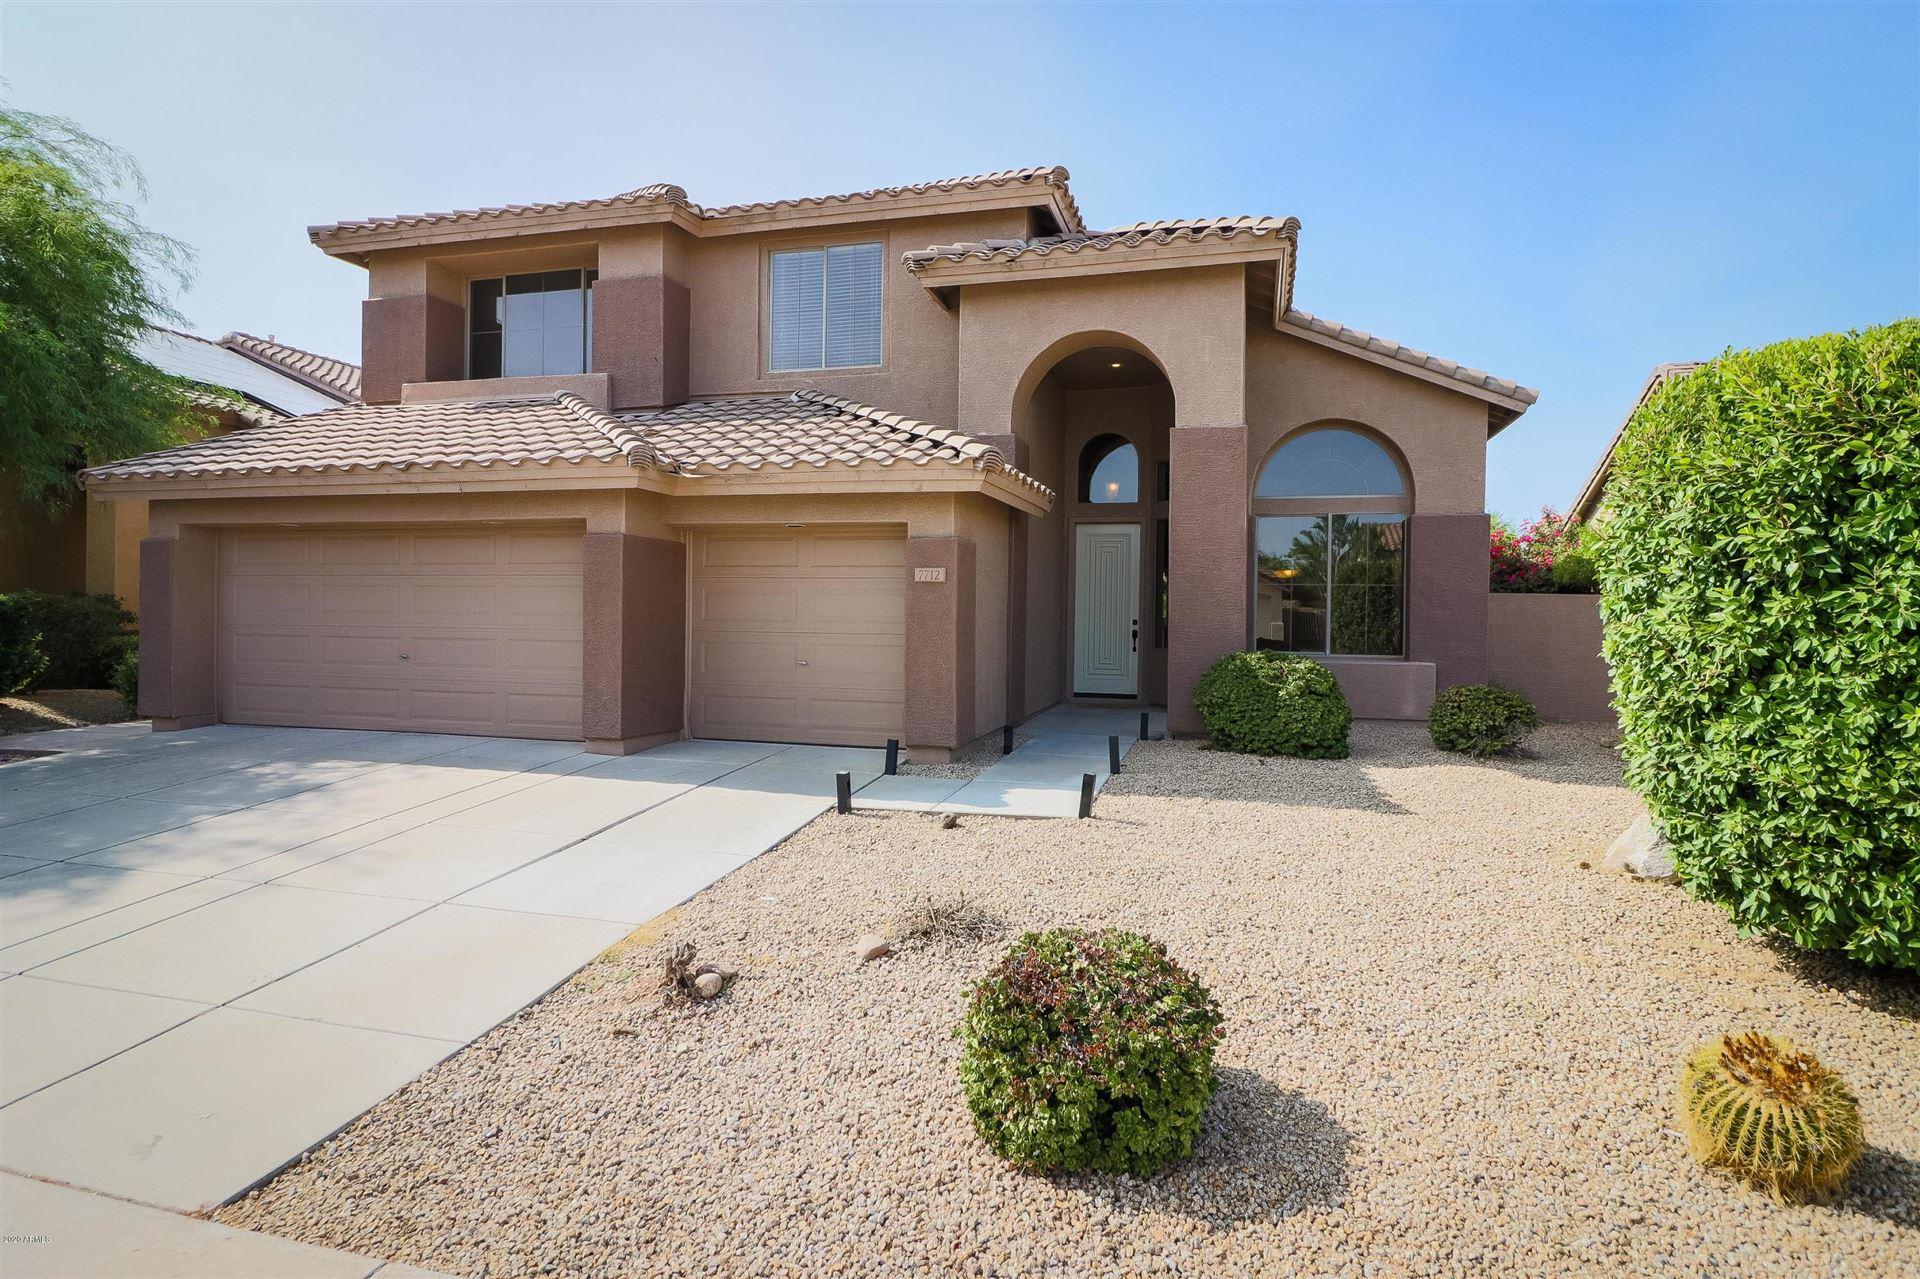 7712 E JOURNEY Lane, Scottsdale, AZ 85255 - MLS#: 6133886